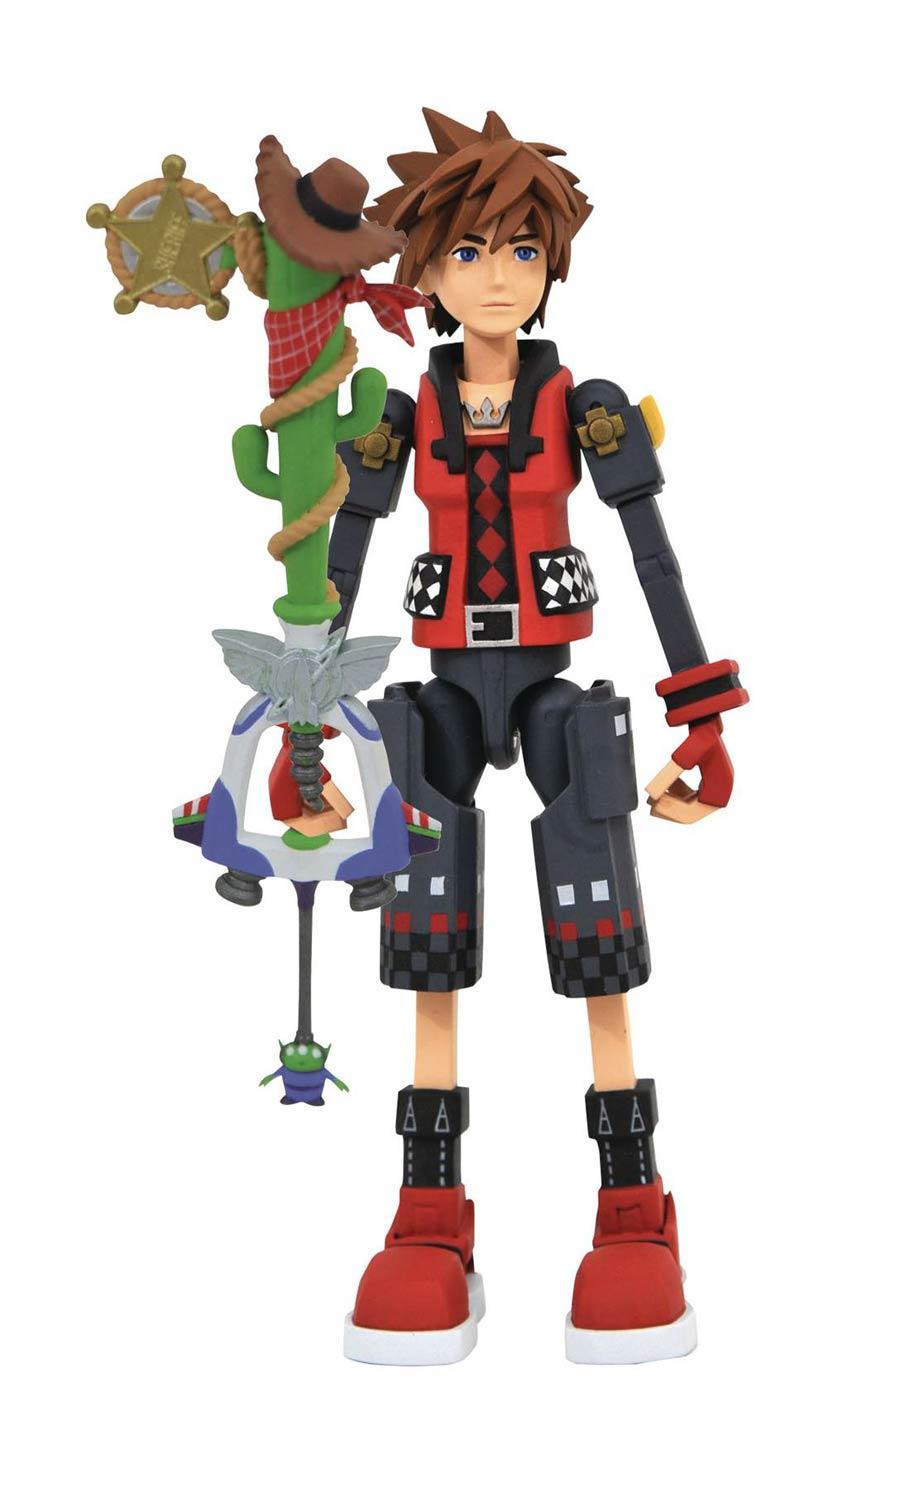 Kingdom Hearts III Toy Story Valor Form Sora Action Figure